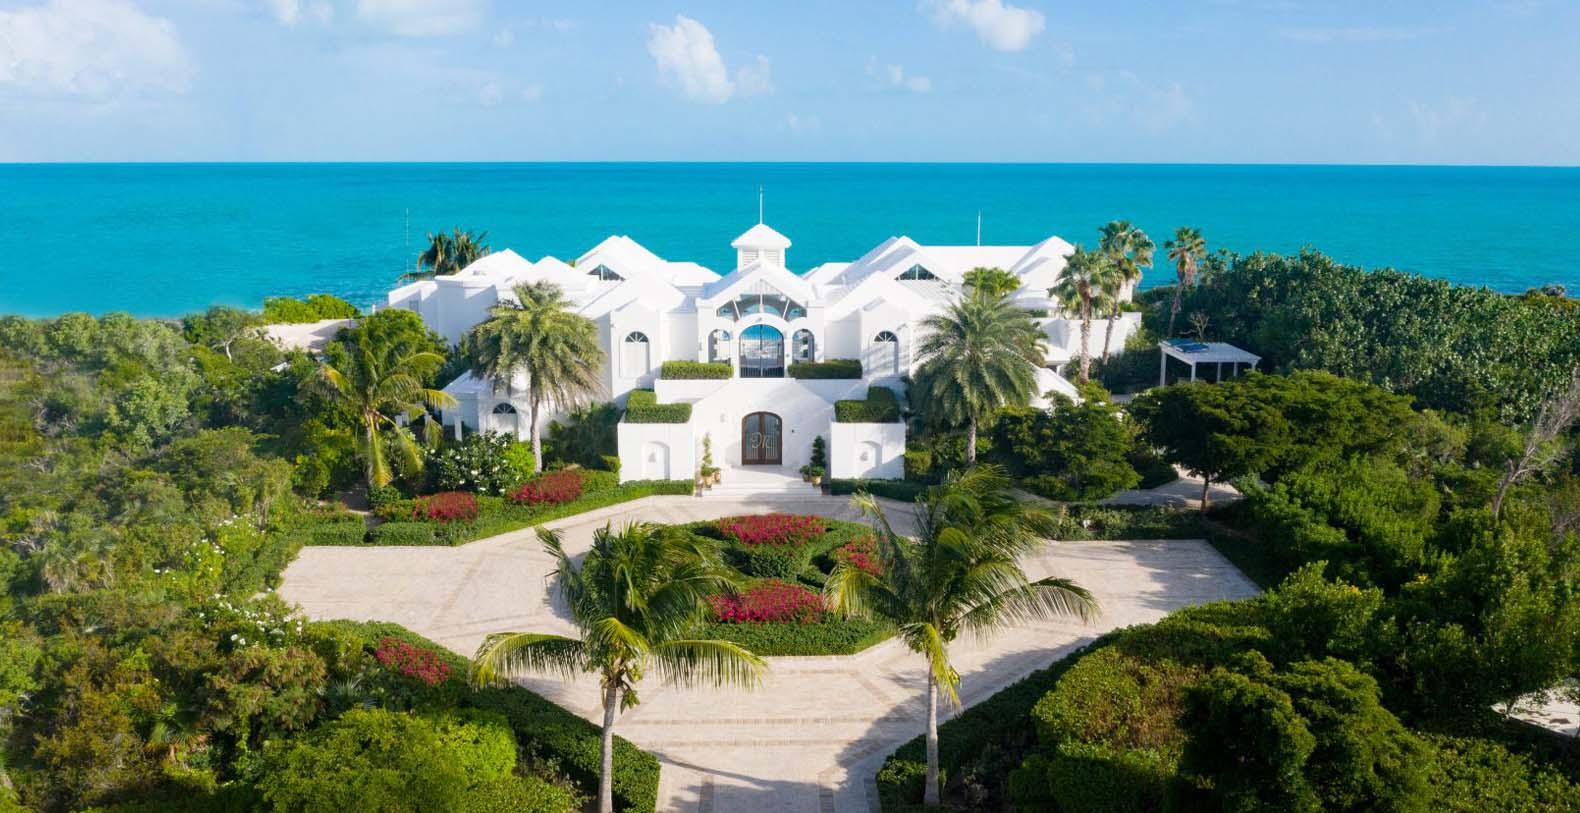 Mandalay Turks Amp Caicos Vacation Rental